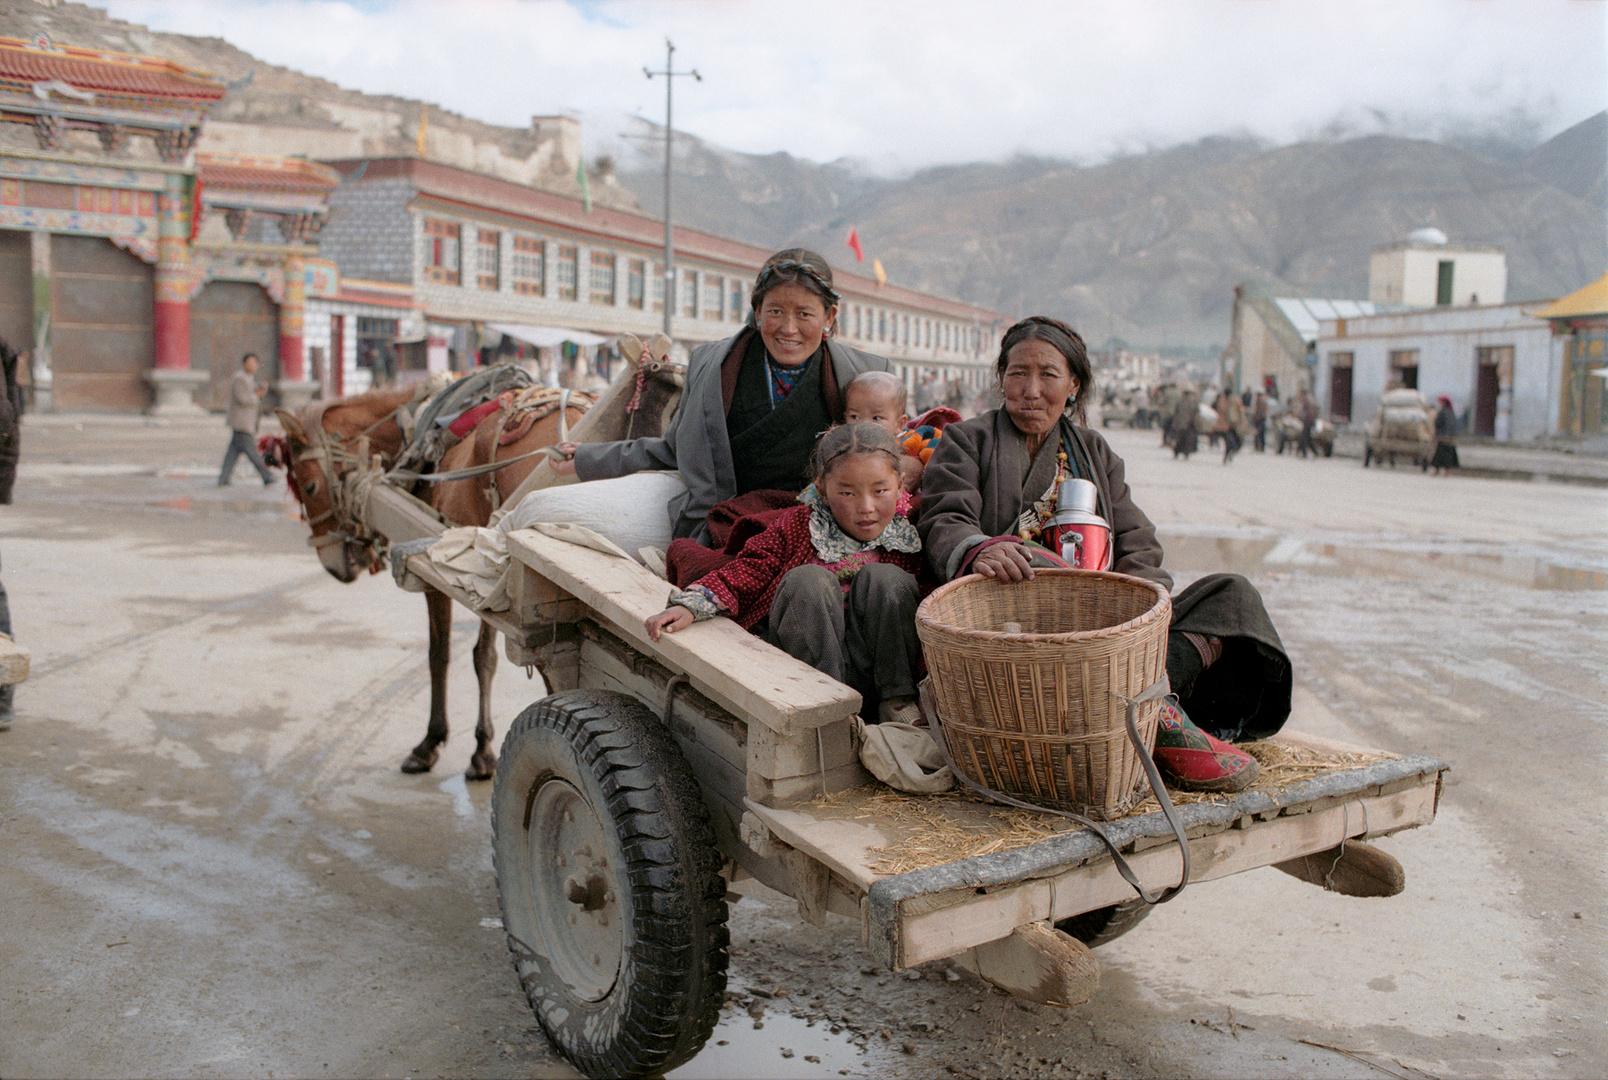 Tibetkutsche